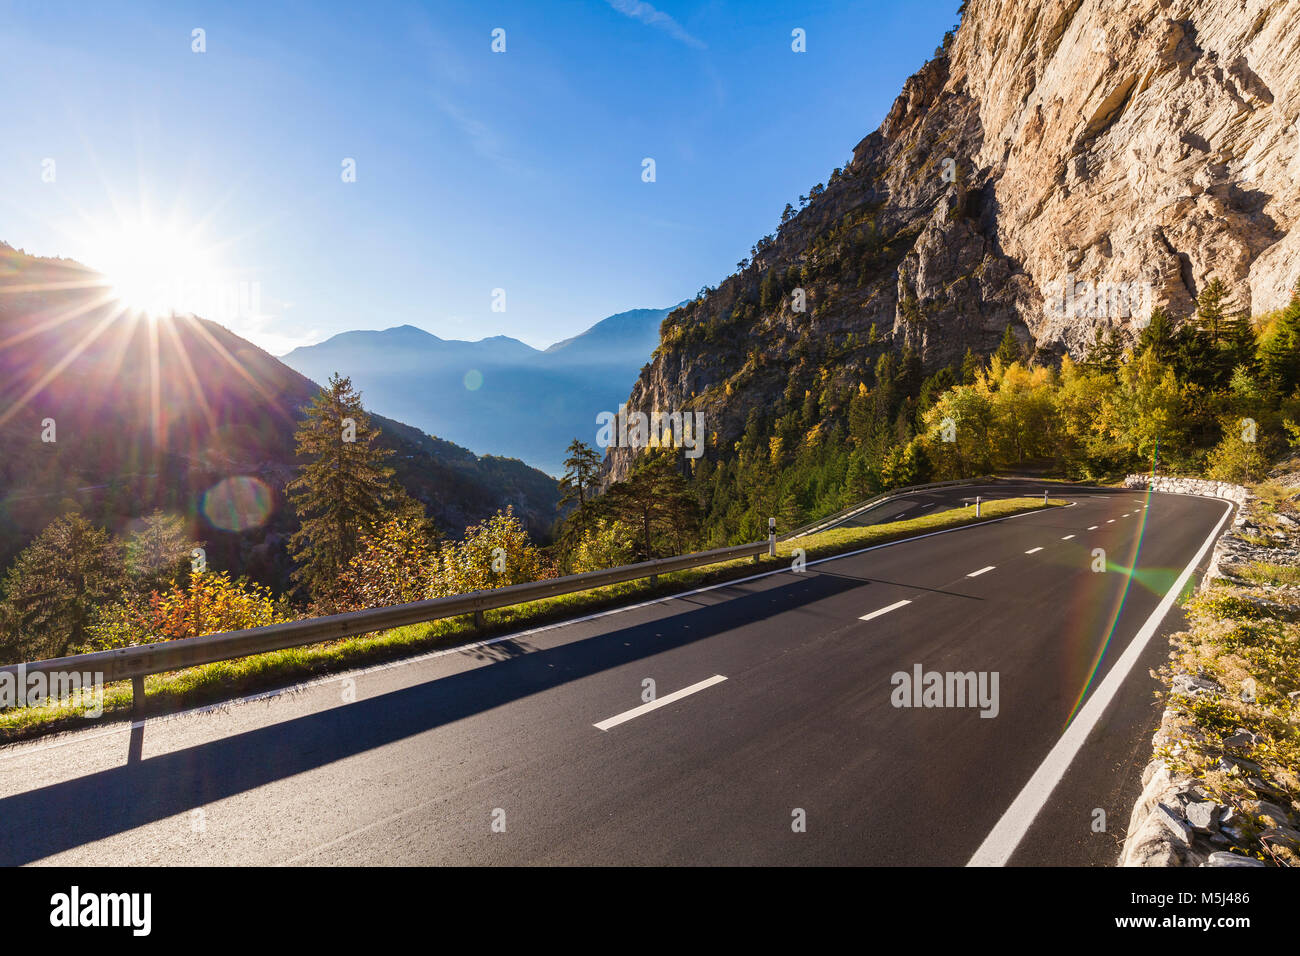 Schweiz, Kanton Wallis, bei Leukerbad, Alpenstraße, Straße, Kehre, Haarnadelkurve, Kurve, Berge, Gebirge - Stock Image